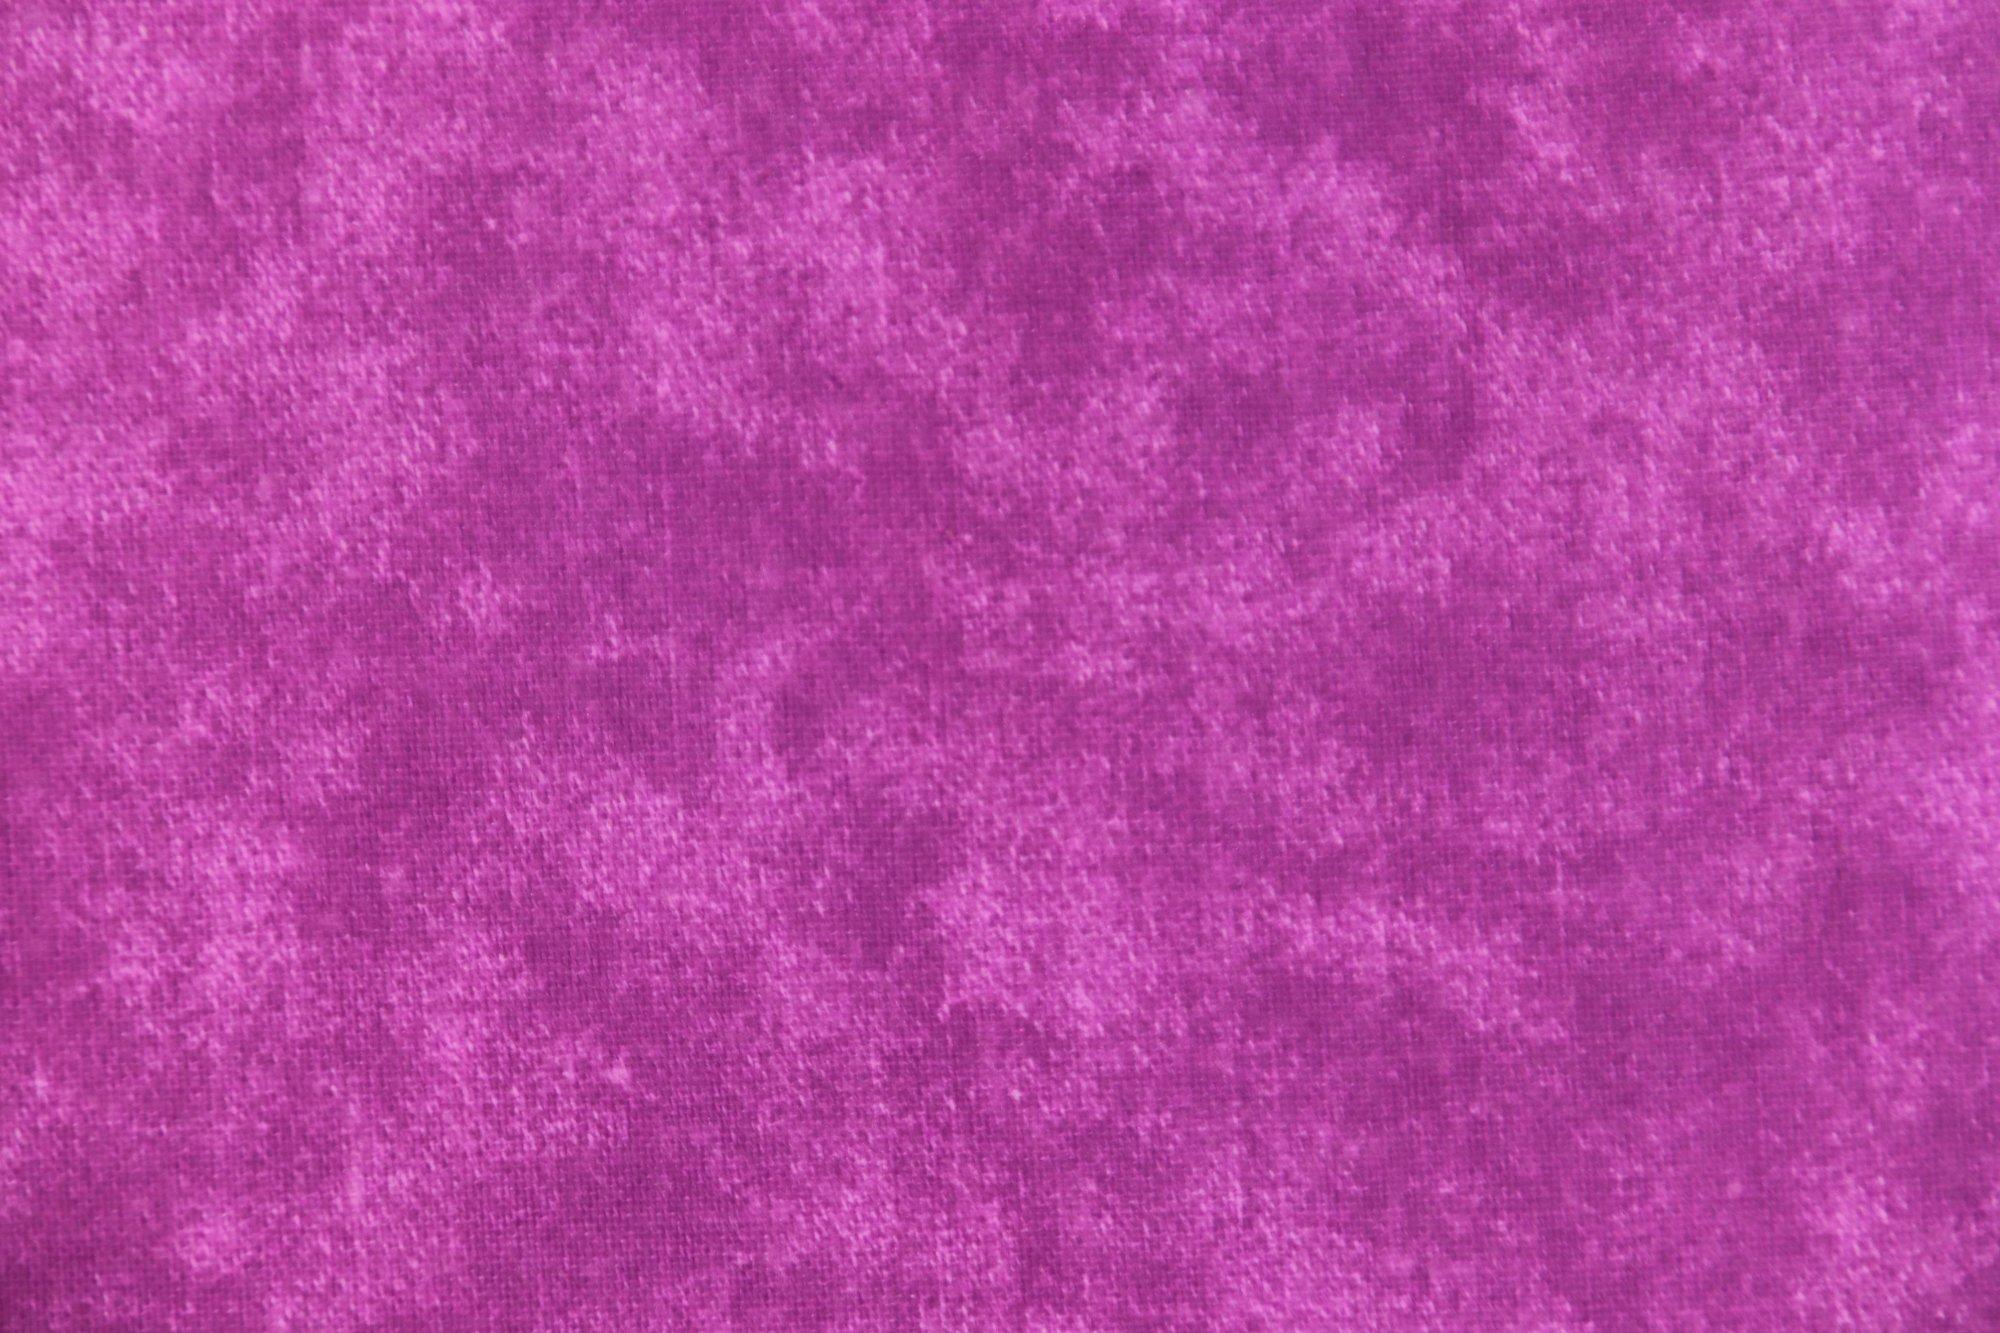 Basic Palette 743285041442 Lavendar - Fat Quarter